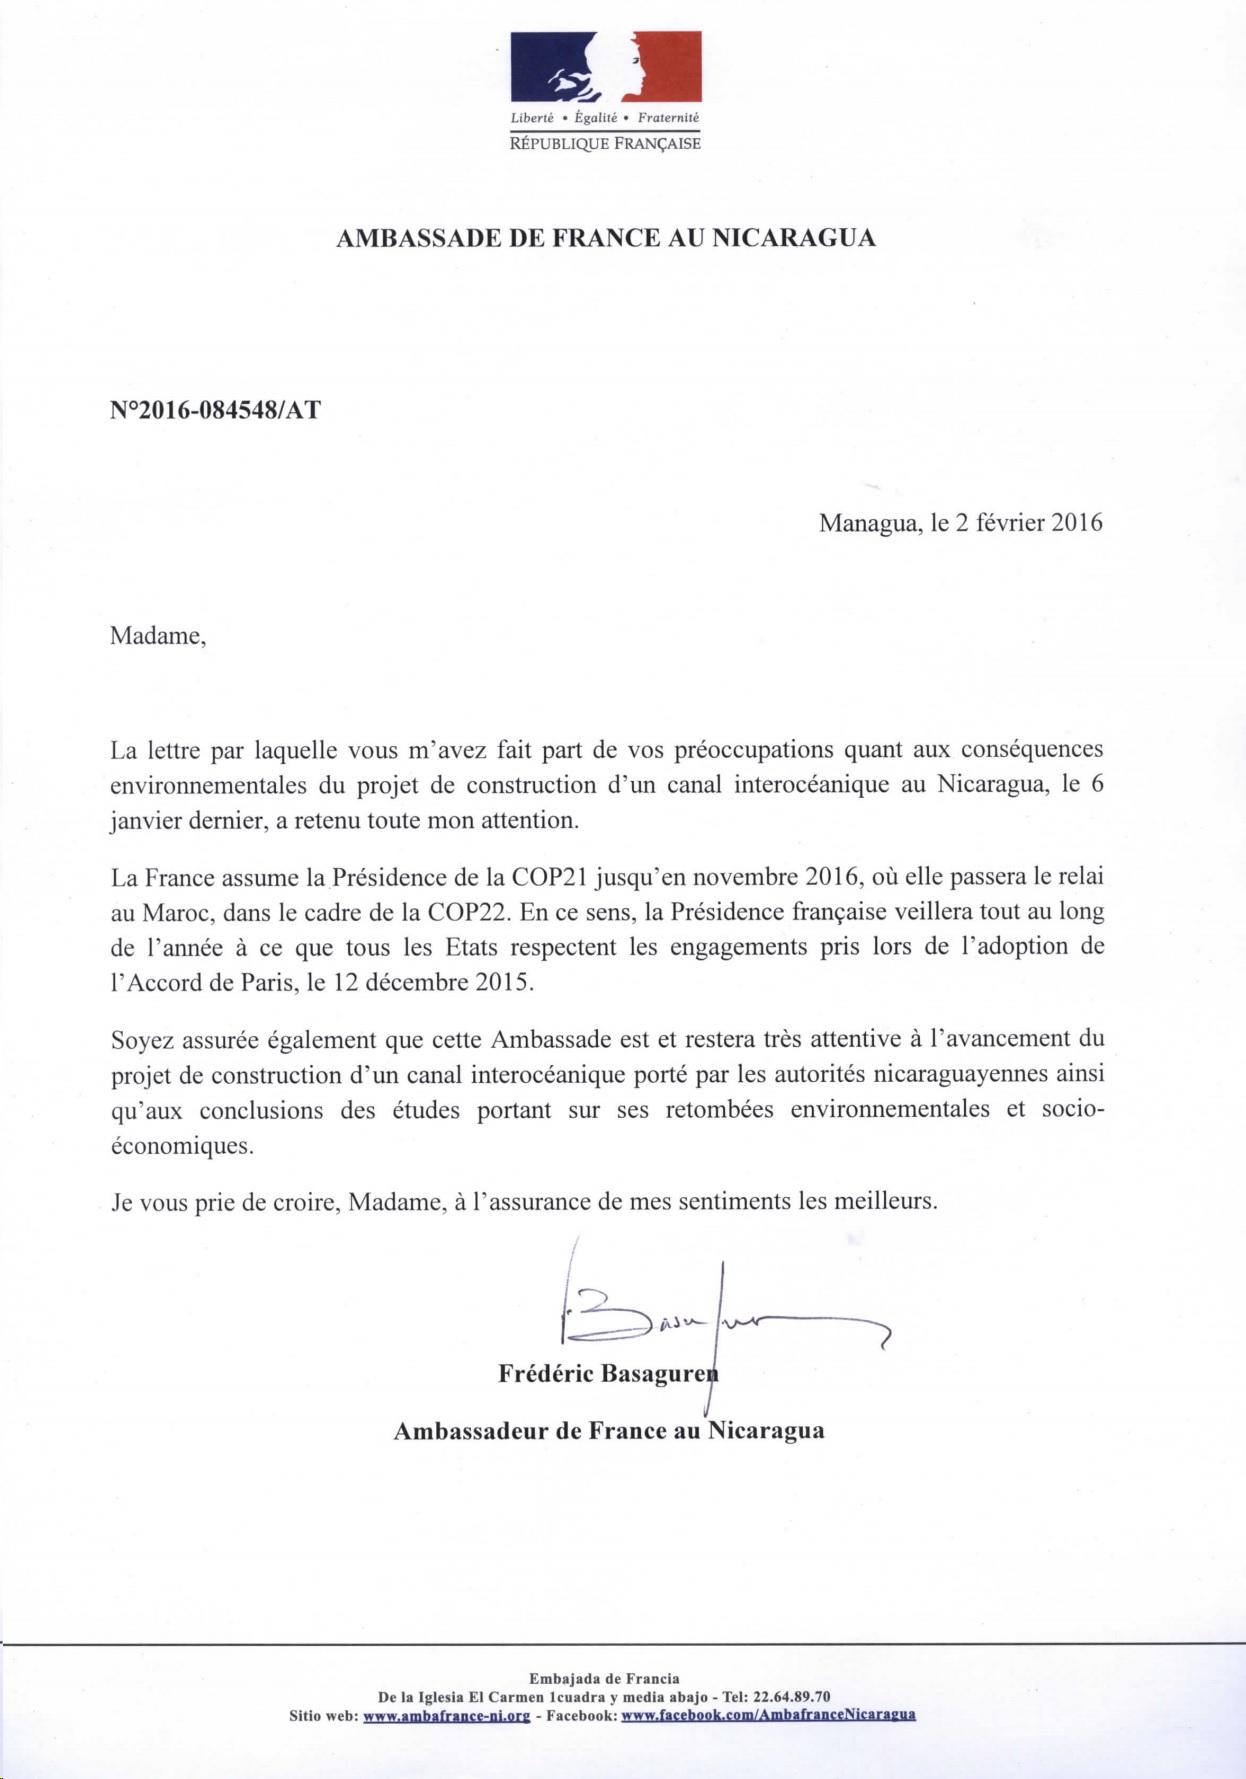 Courrier réponse ambassade Canal Nicaragua